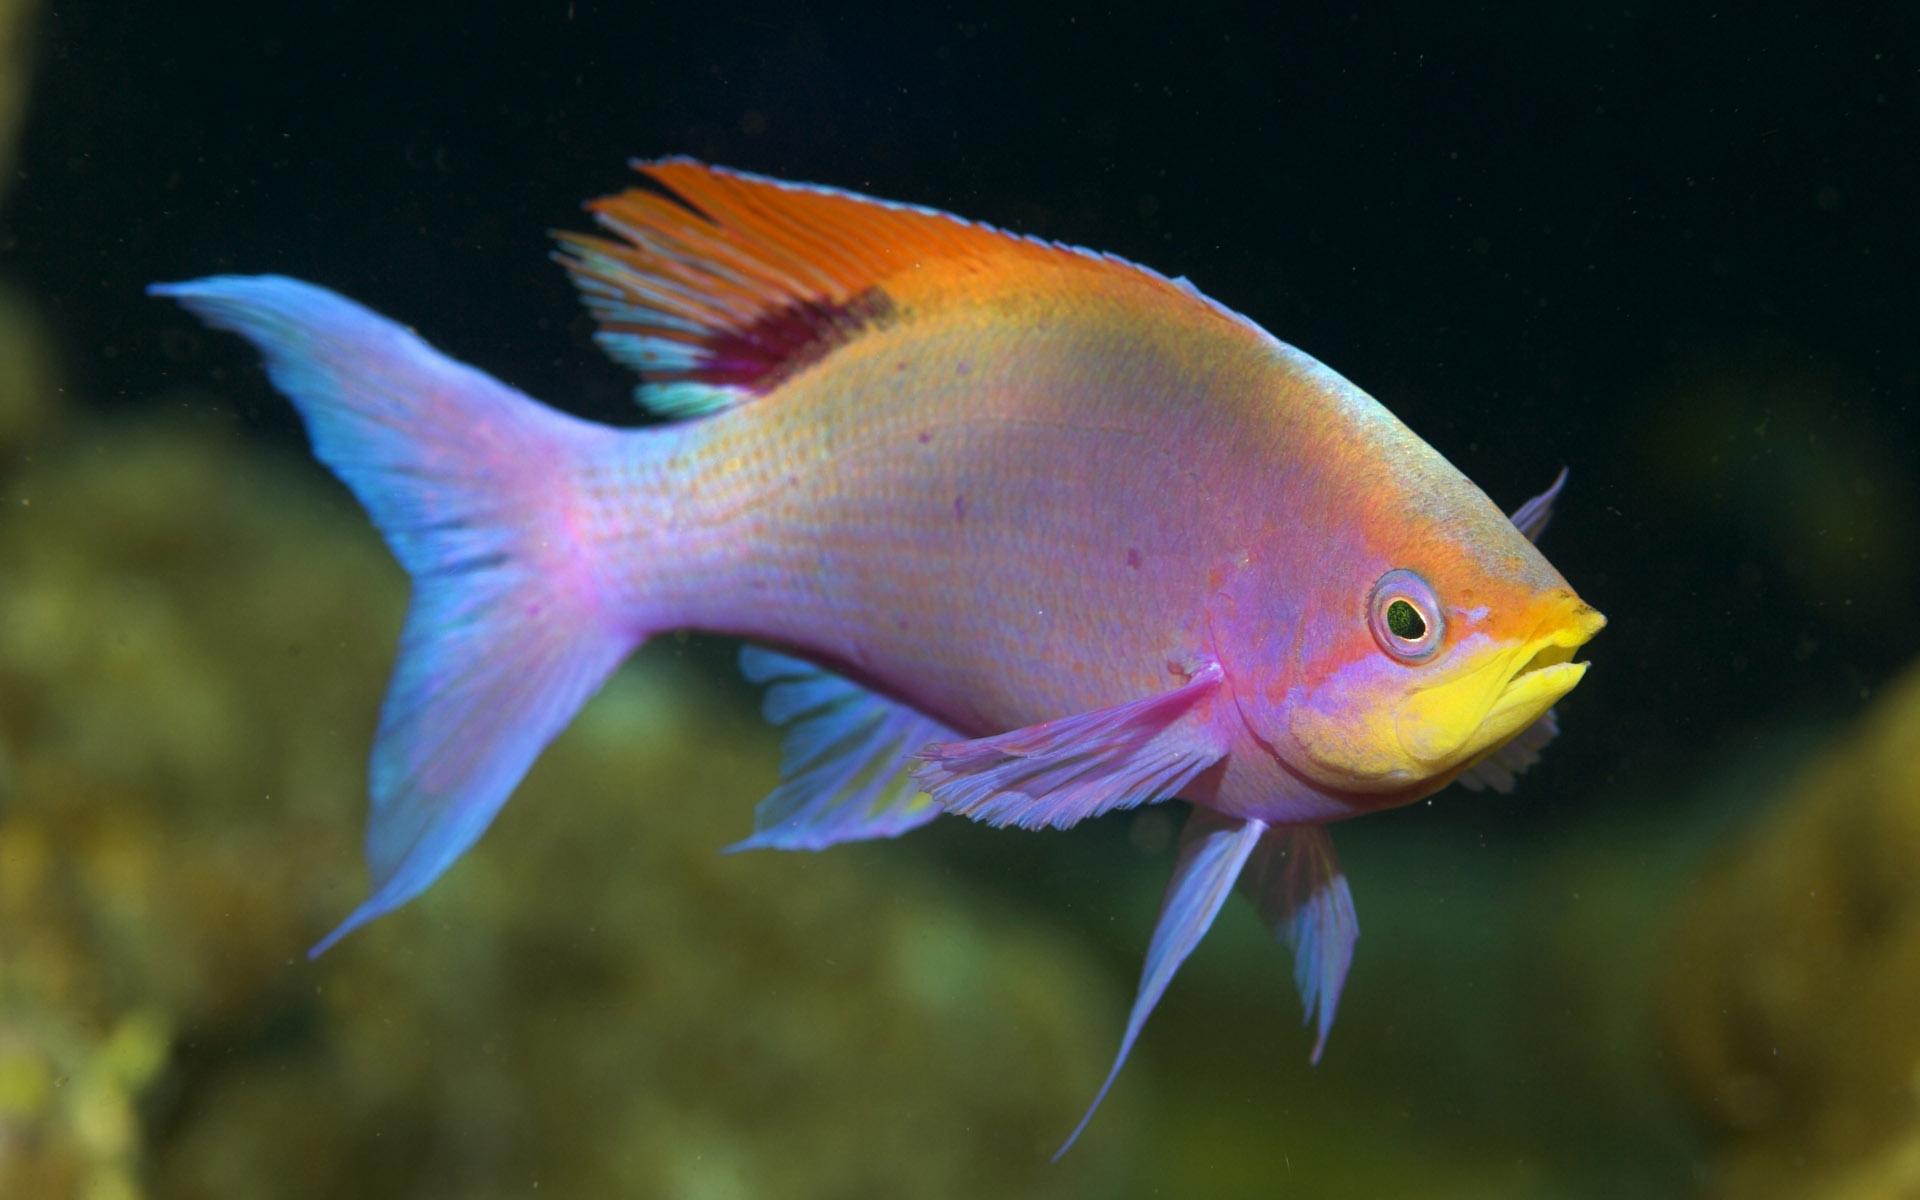 fish marlin desktop 1920x1200 - photo #33